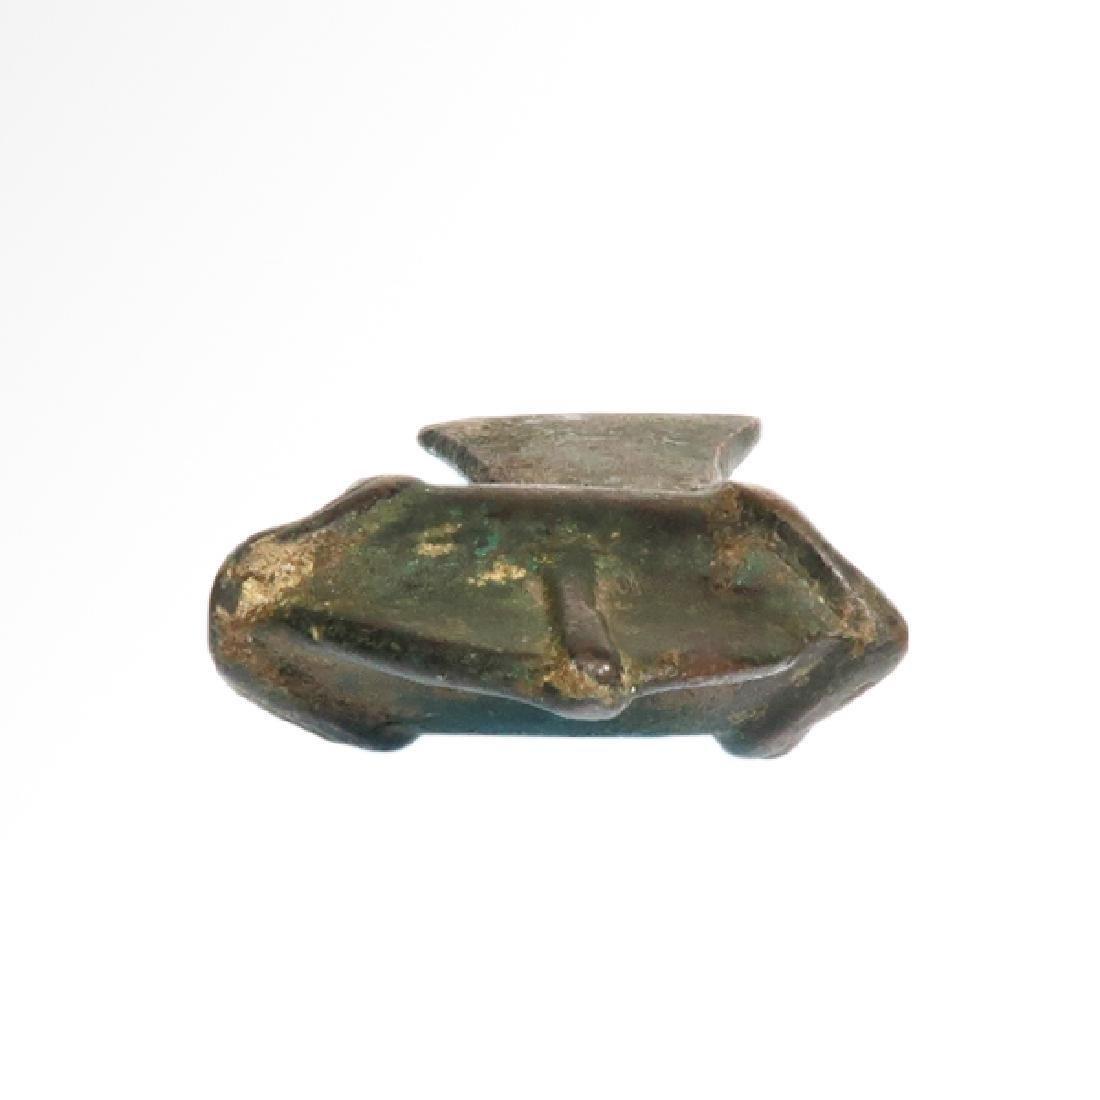 Luristan Bronze Axe, c. 9th Century B.C. - 6